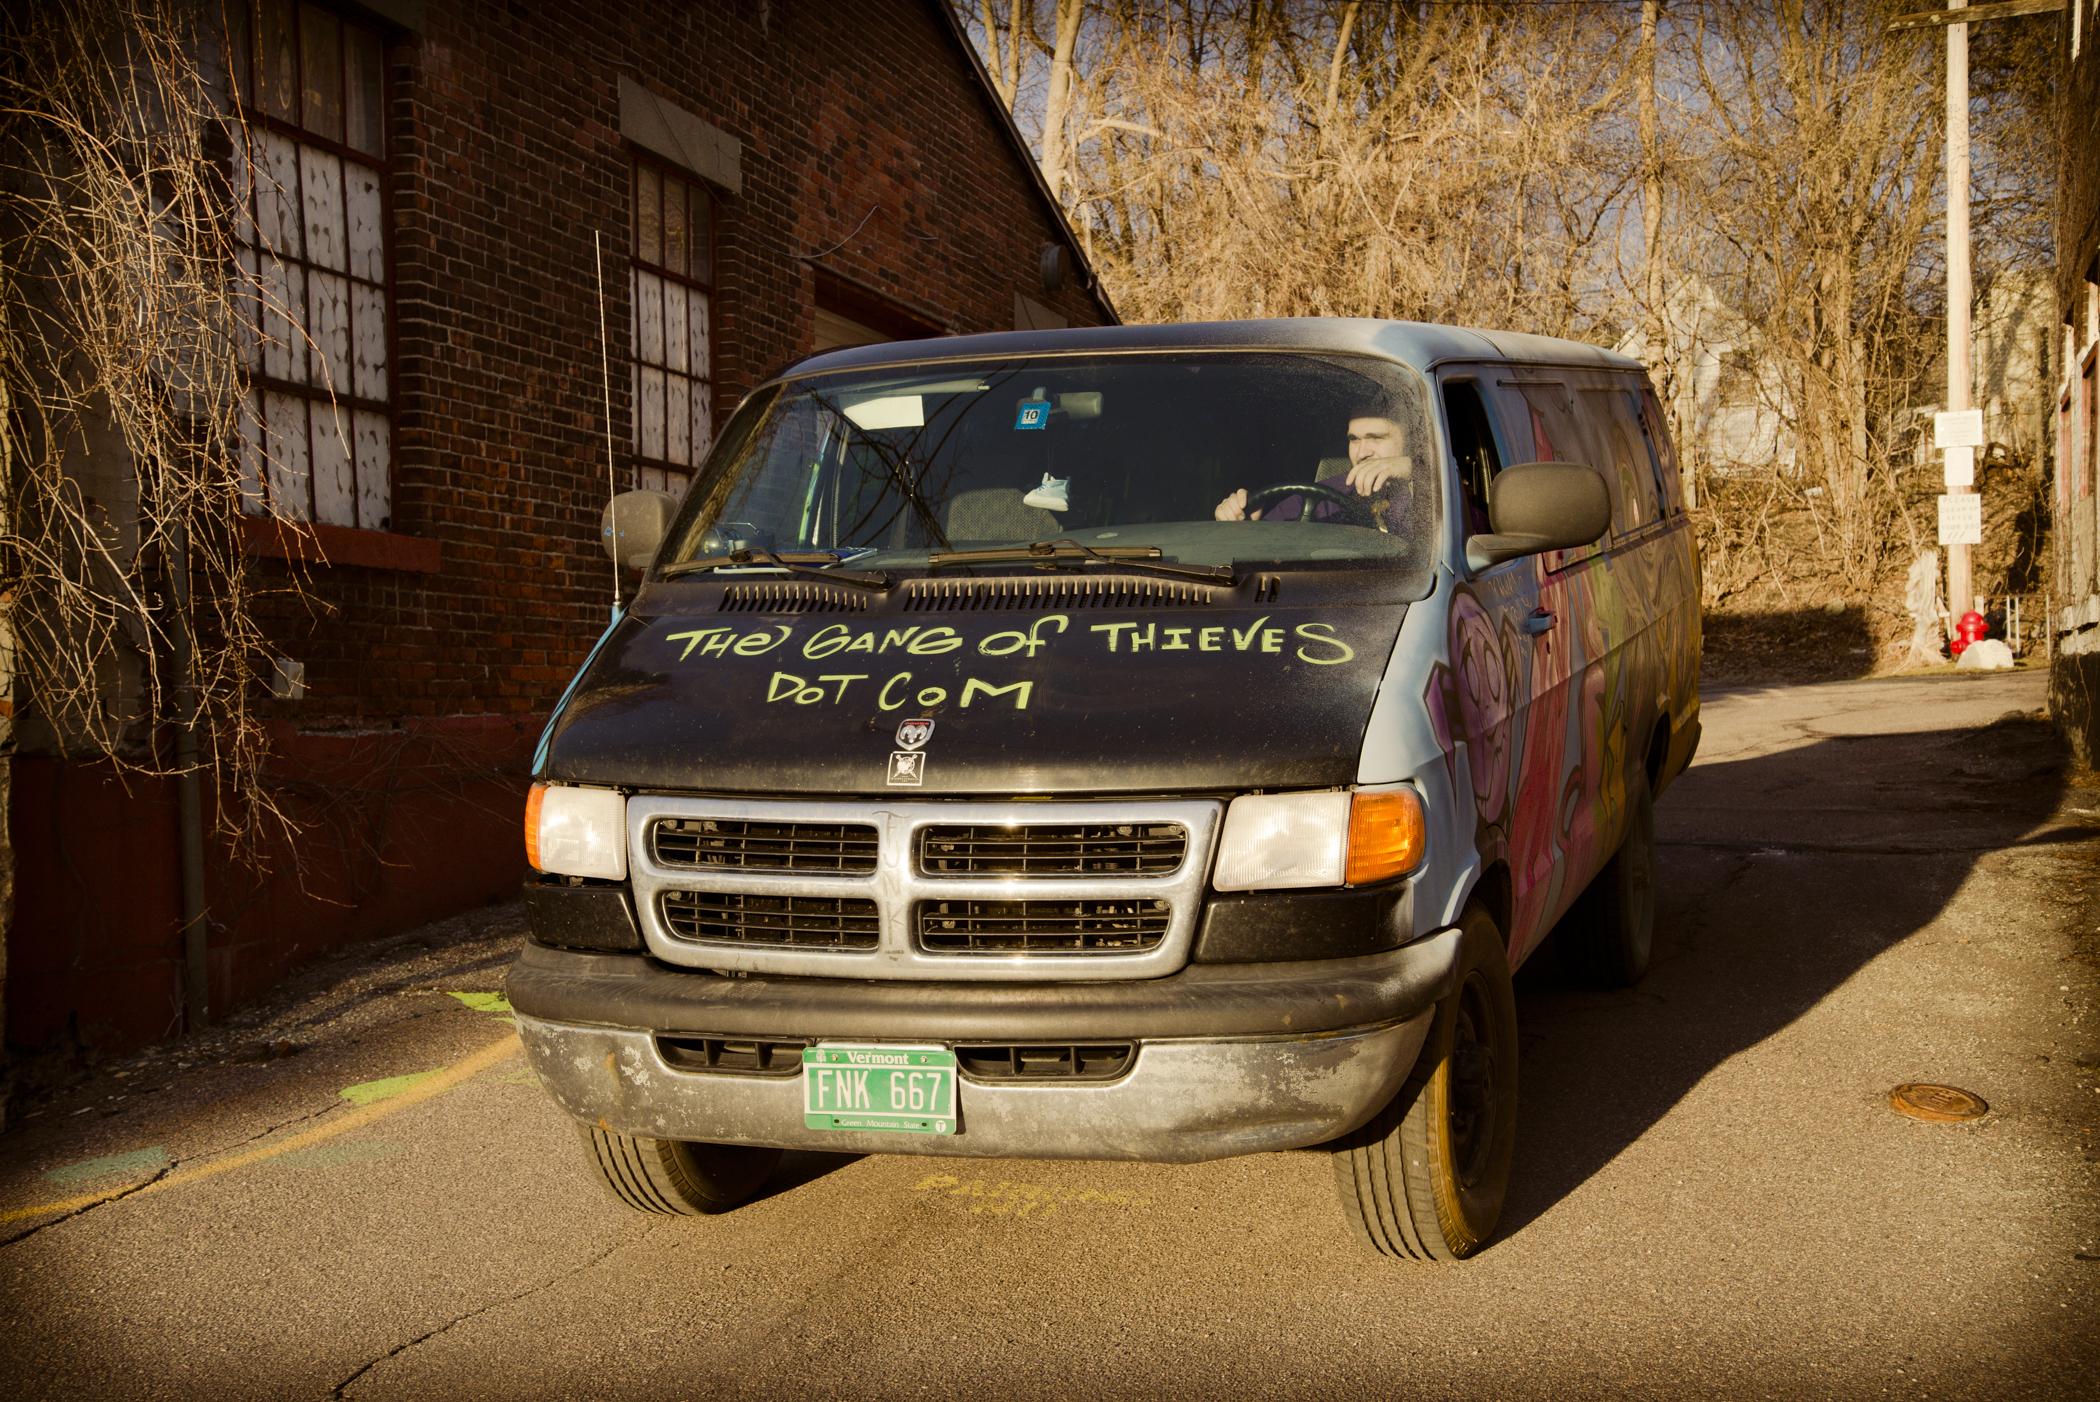 04202014-GangofThievesThunderfunk-JuliaLuckettPhotography-62.jpg